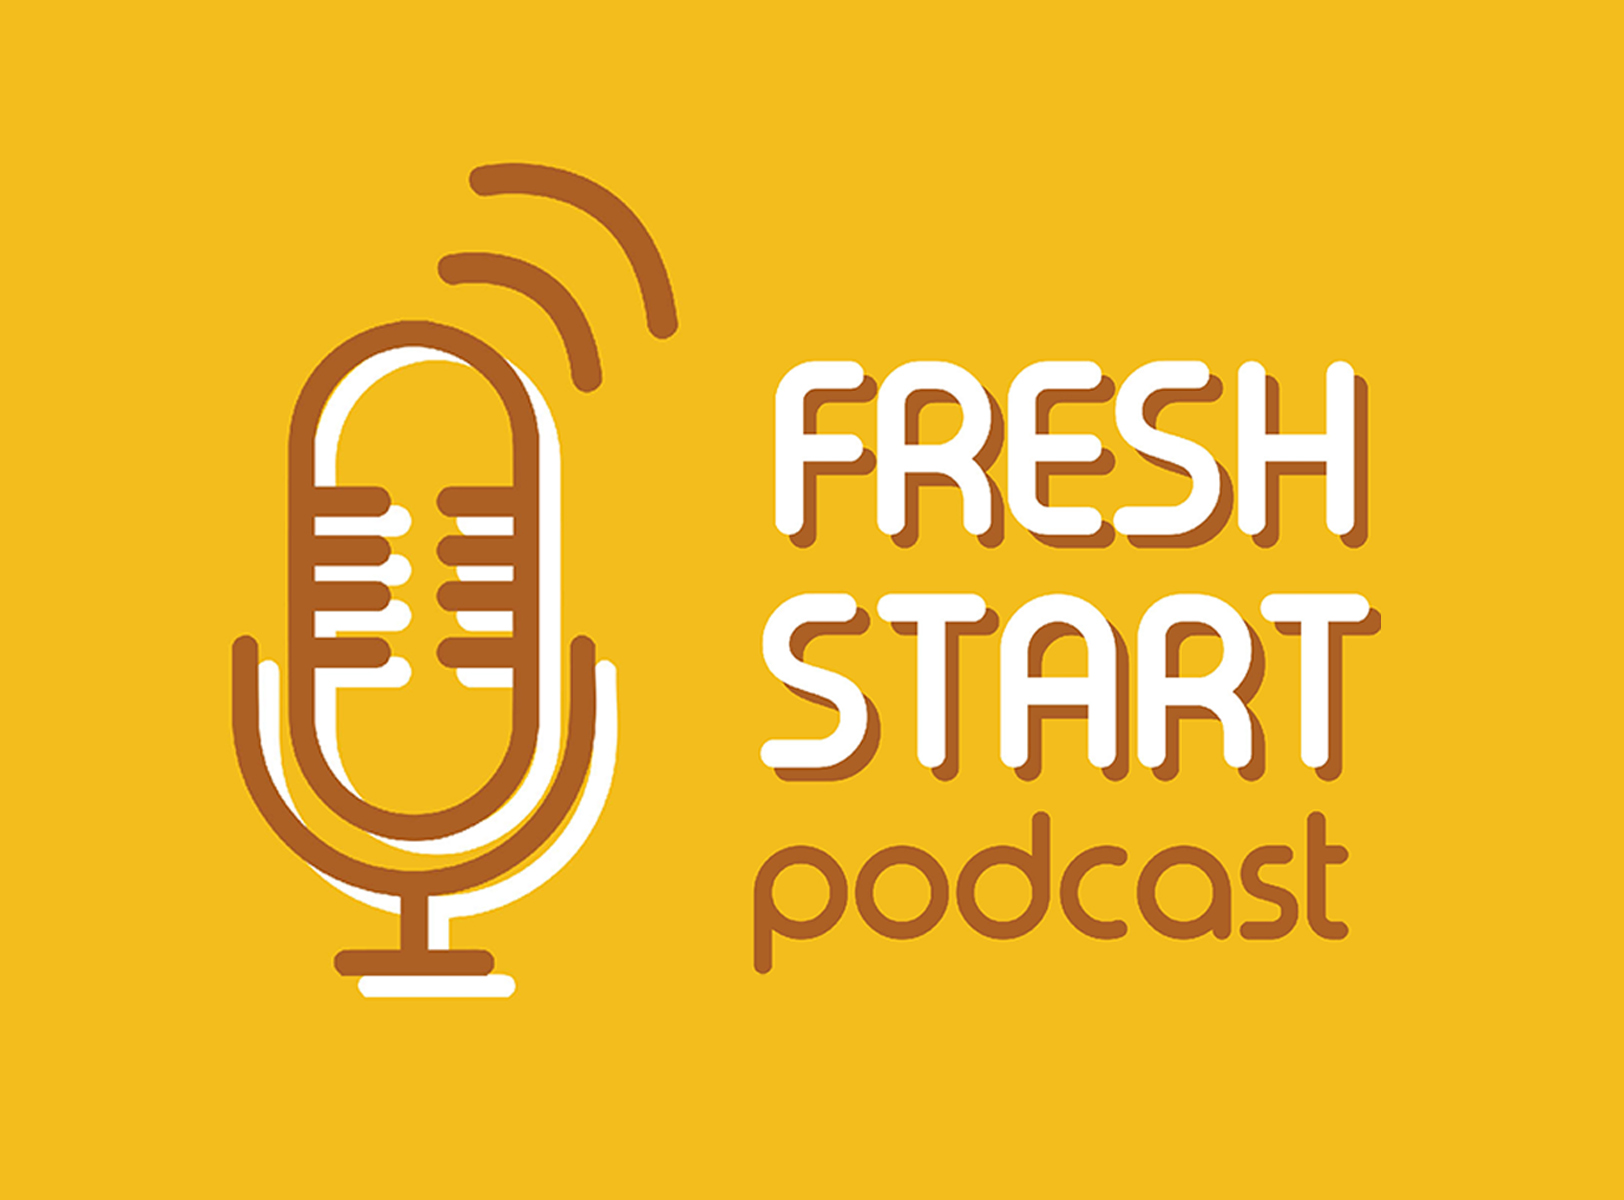 Fresh Start: Podcast News (9/11/2019 Wed.)